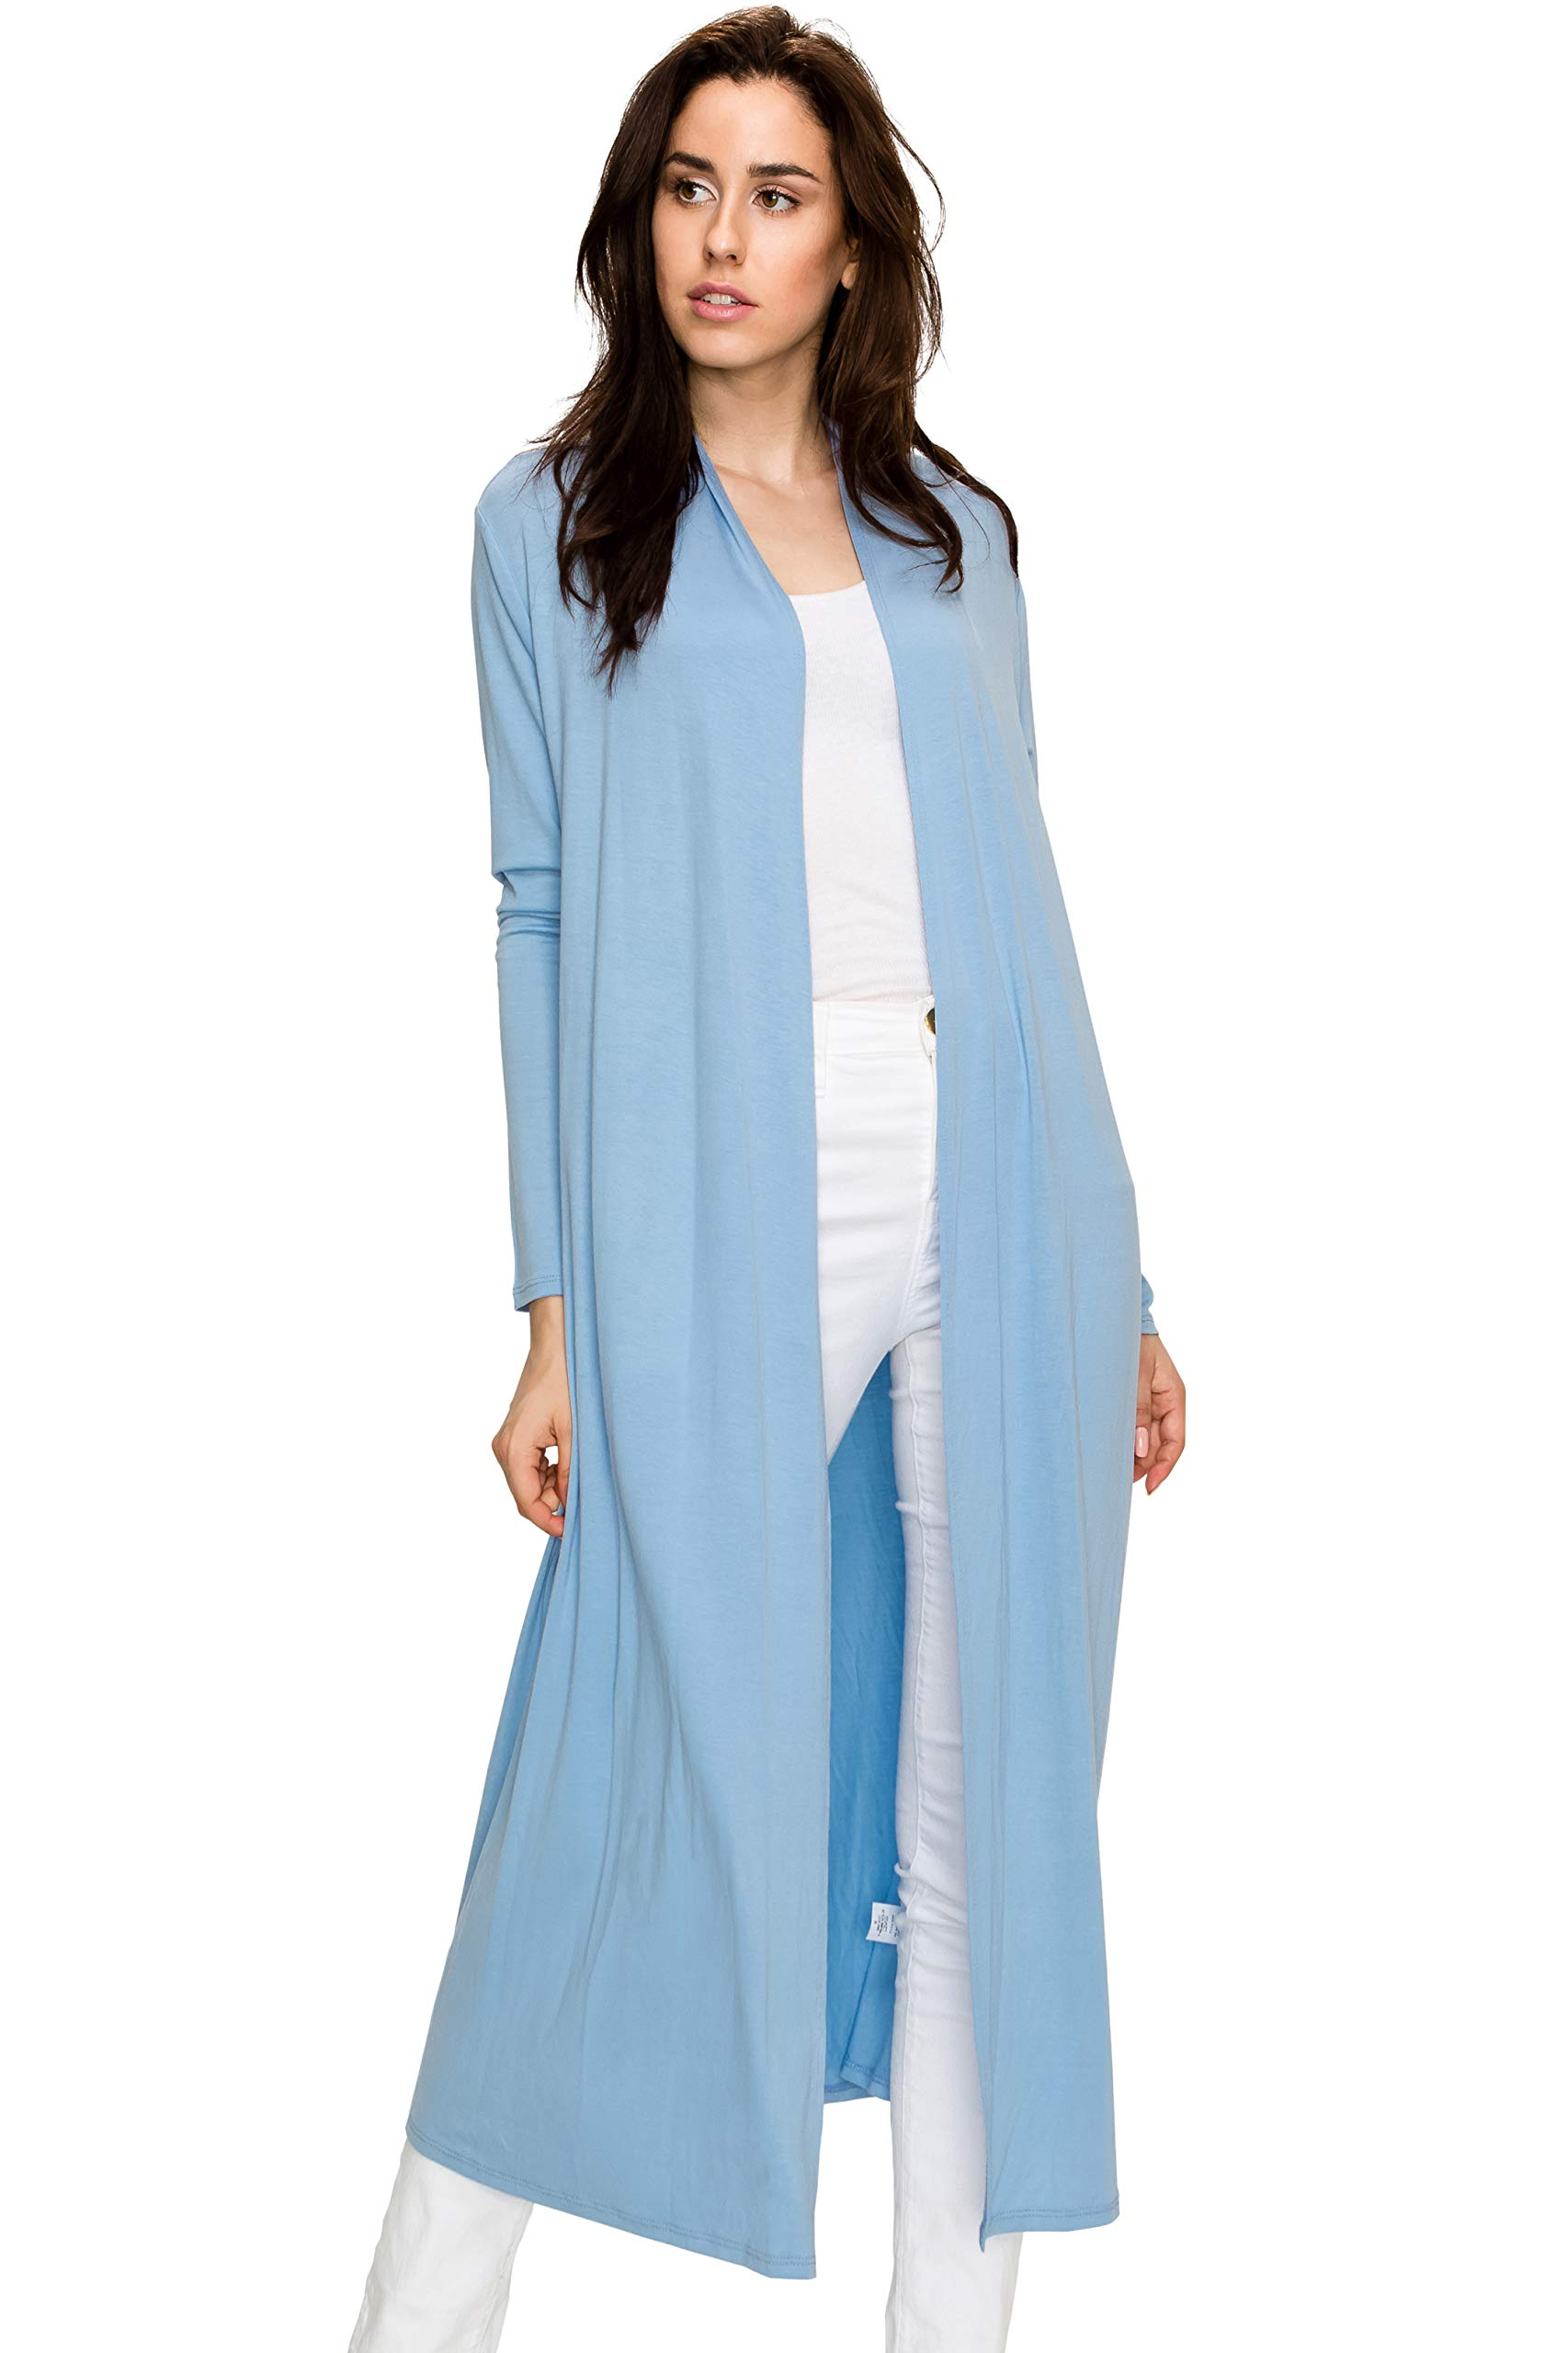 6cfd0c706d8 Galleon - EttelLut Maxi Long Open Front Lightweight Cardigan Sweaters  Regular Plus Size Baby Blue XXXL